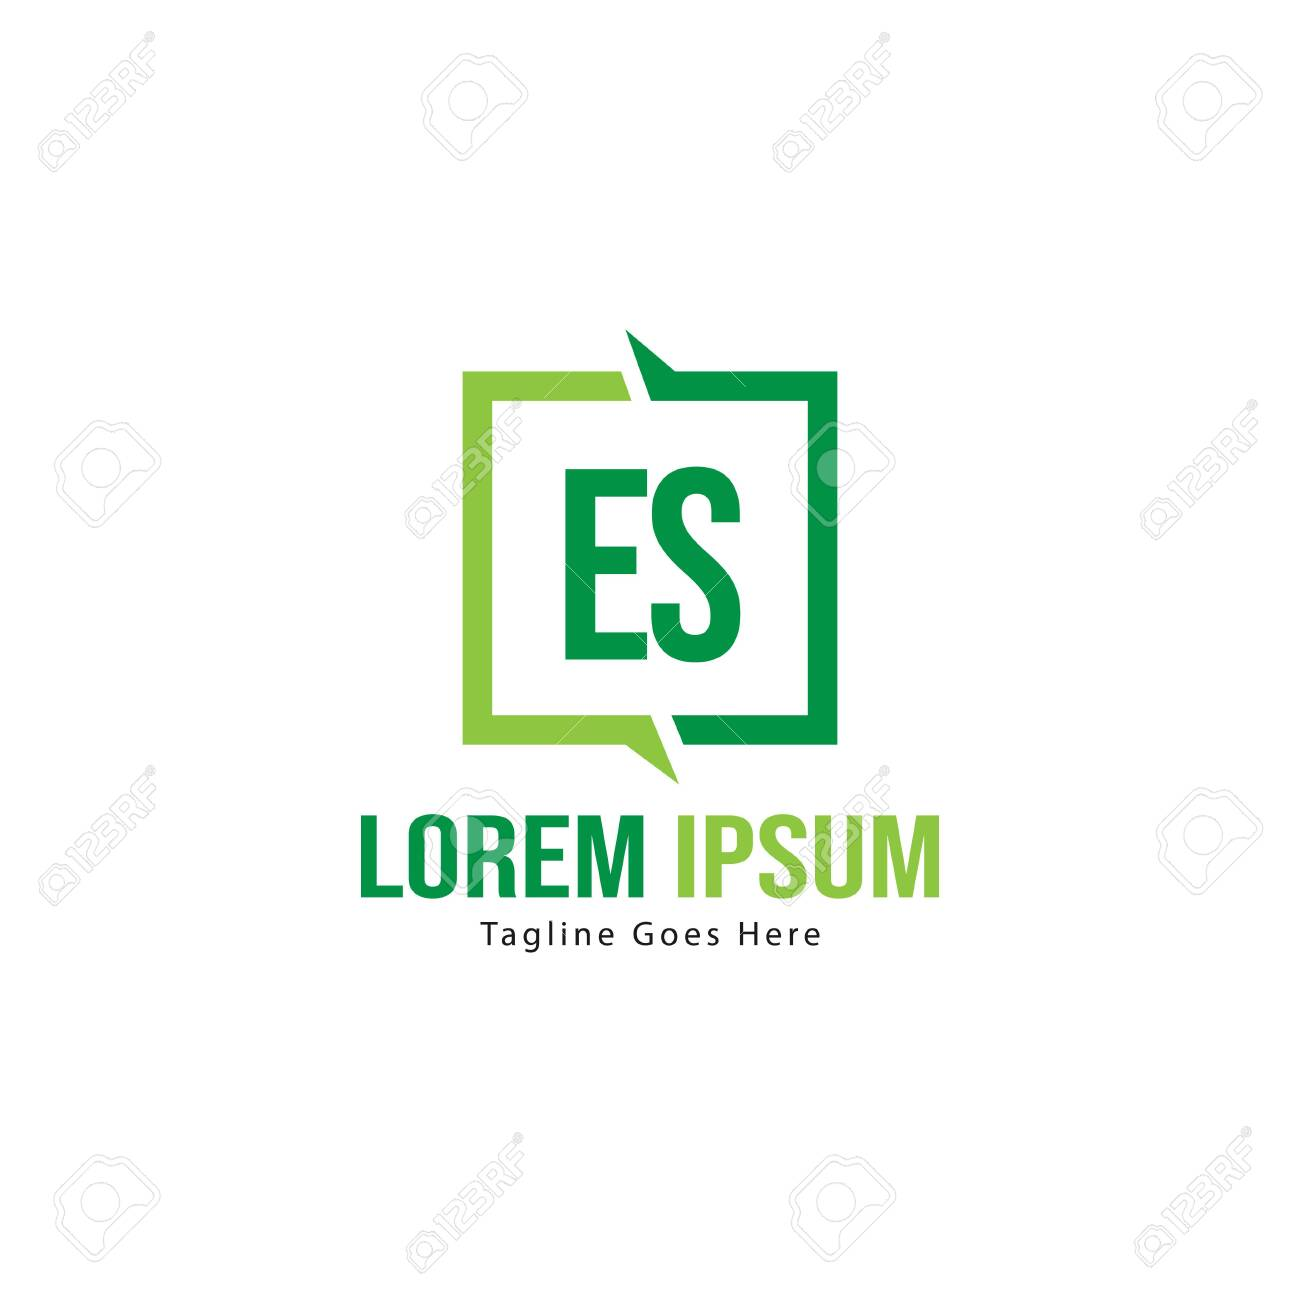 Initial ES logo template with modern frame. Minimalist ES letter logo vector illustration - 129492901